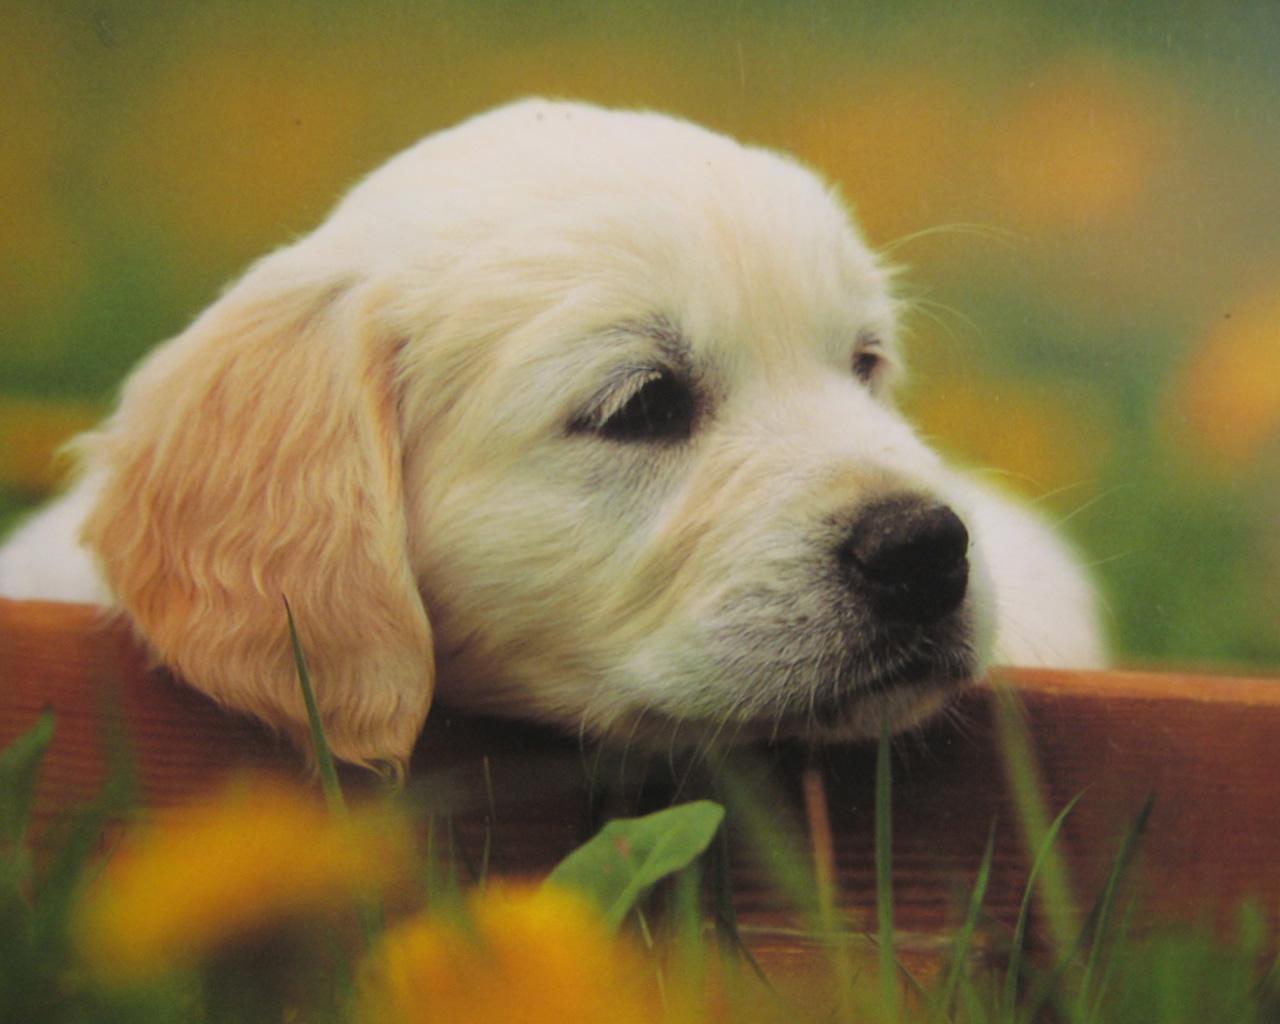 download wallpaper: puppy in de tuin wallpaper